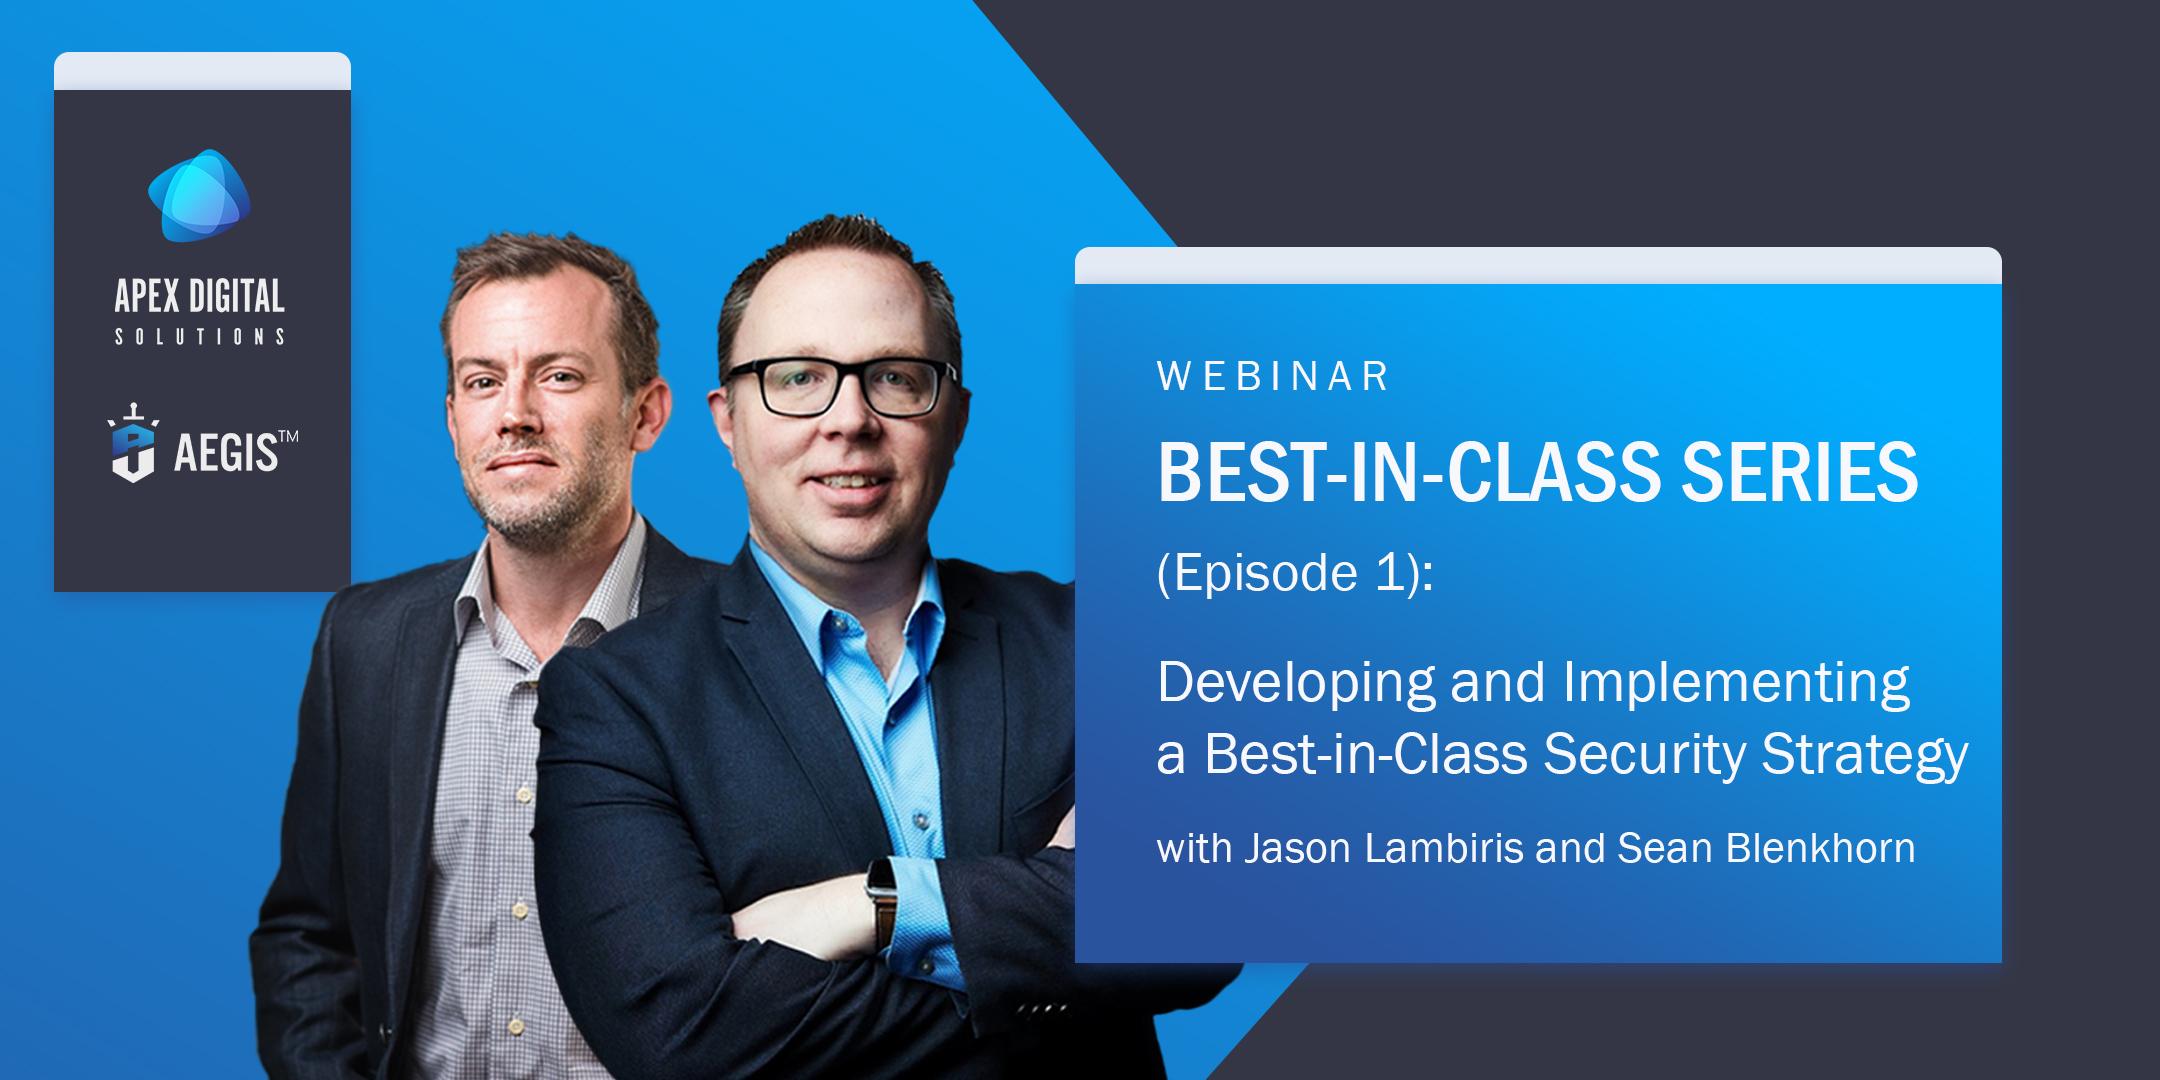 Webinar, Microsoft Security, Apex Digital Solutions, Aegis, Jason Lambiris, Sean Blenkhorn